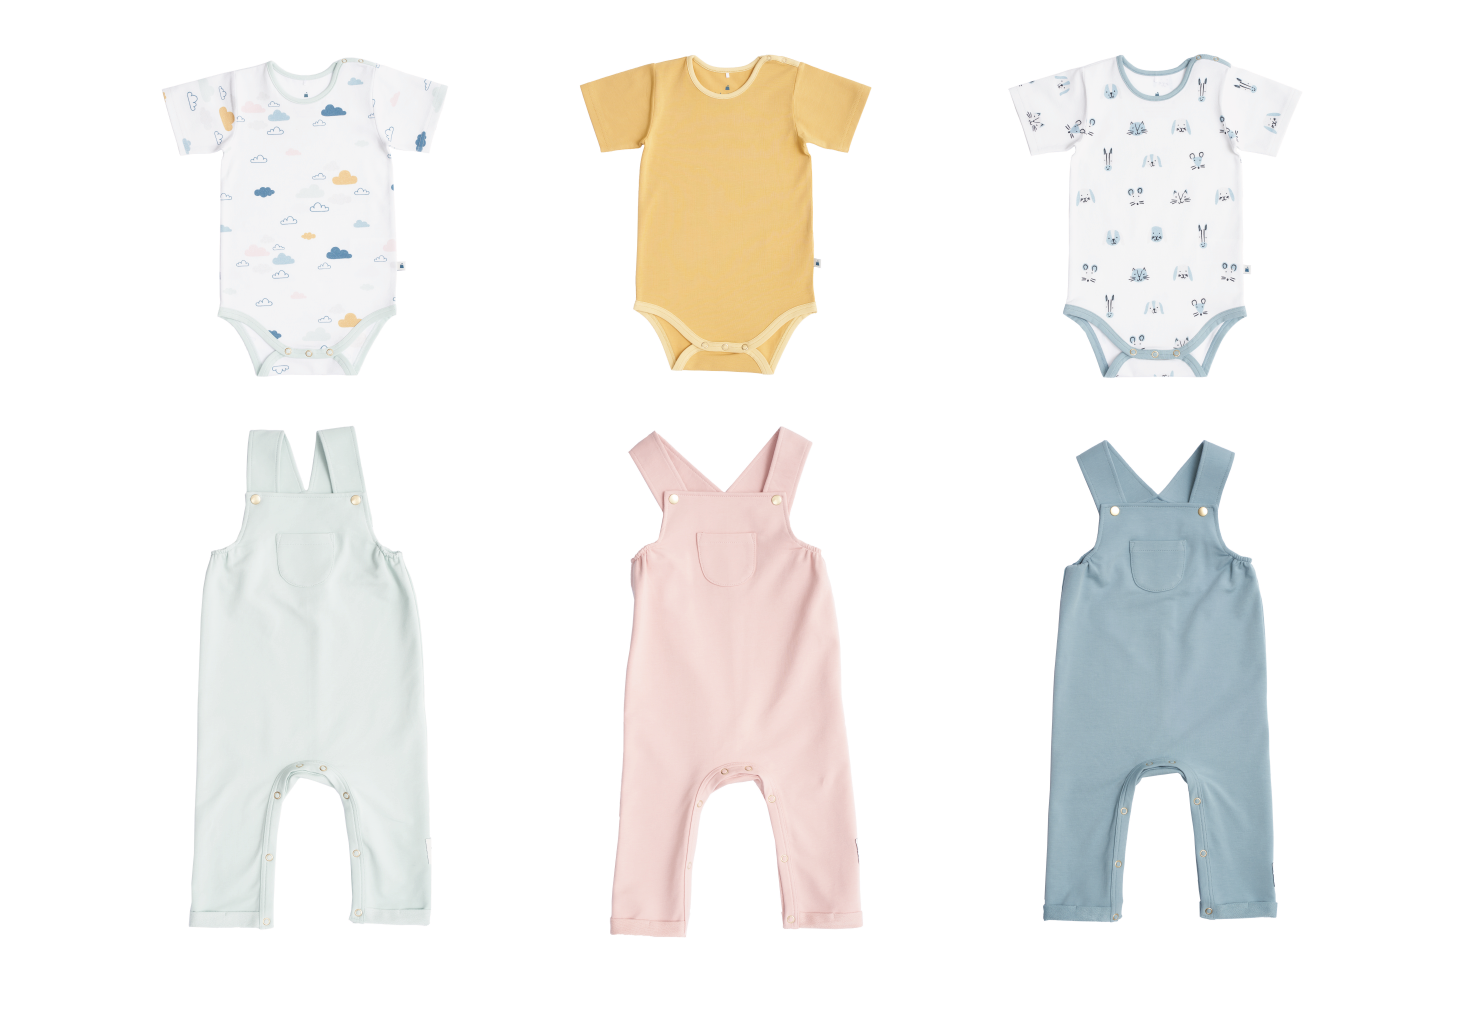 kidswear-designer-cornwall-england05